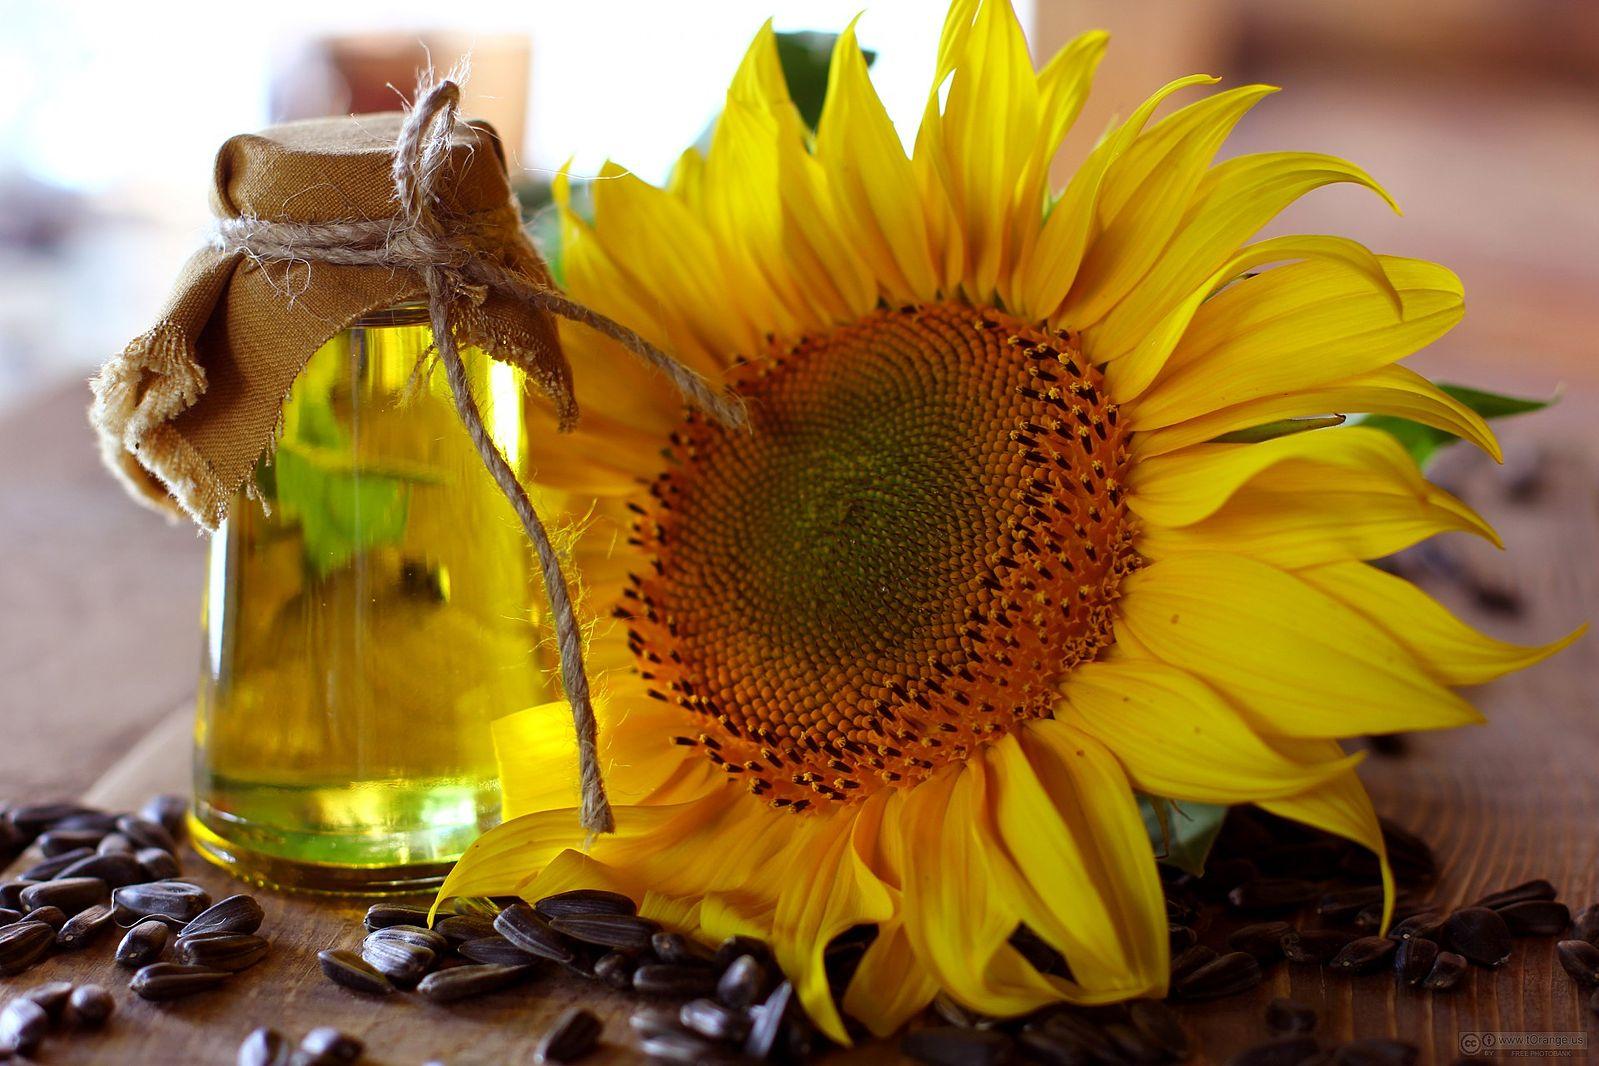 1599px sunflower oil and sunflower